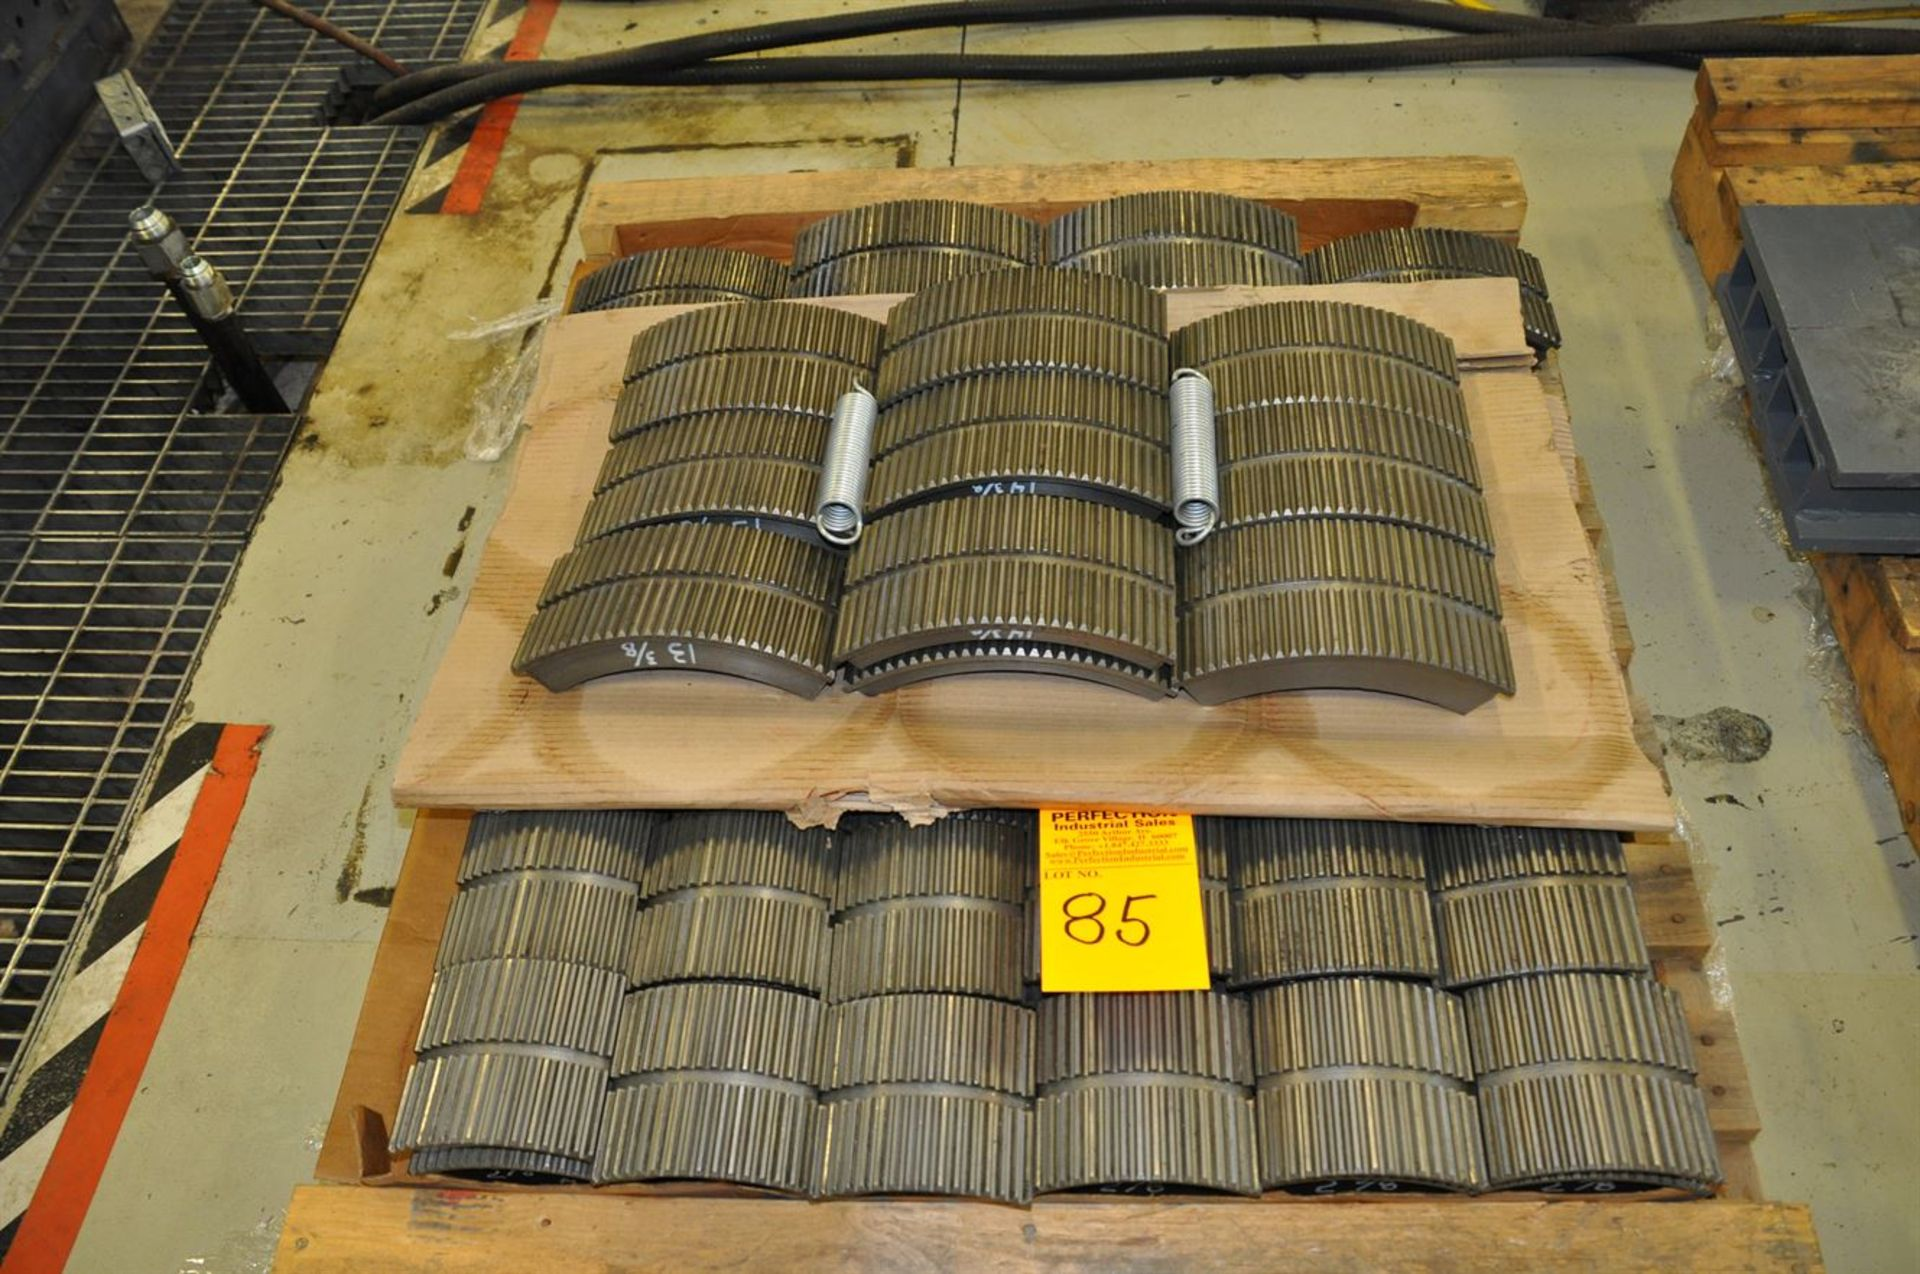 "2012 McCOY CLEBU 1500 15"" Type III Bucking Unit, s/n 8988, w/ PLC Control, Size Range: 15"" – 2. - Image 5 of 6"